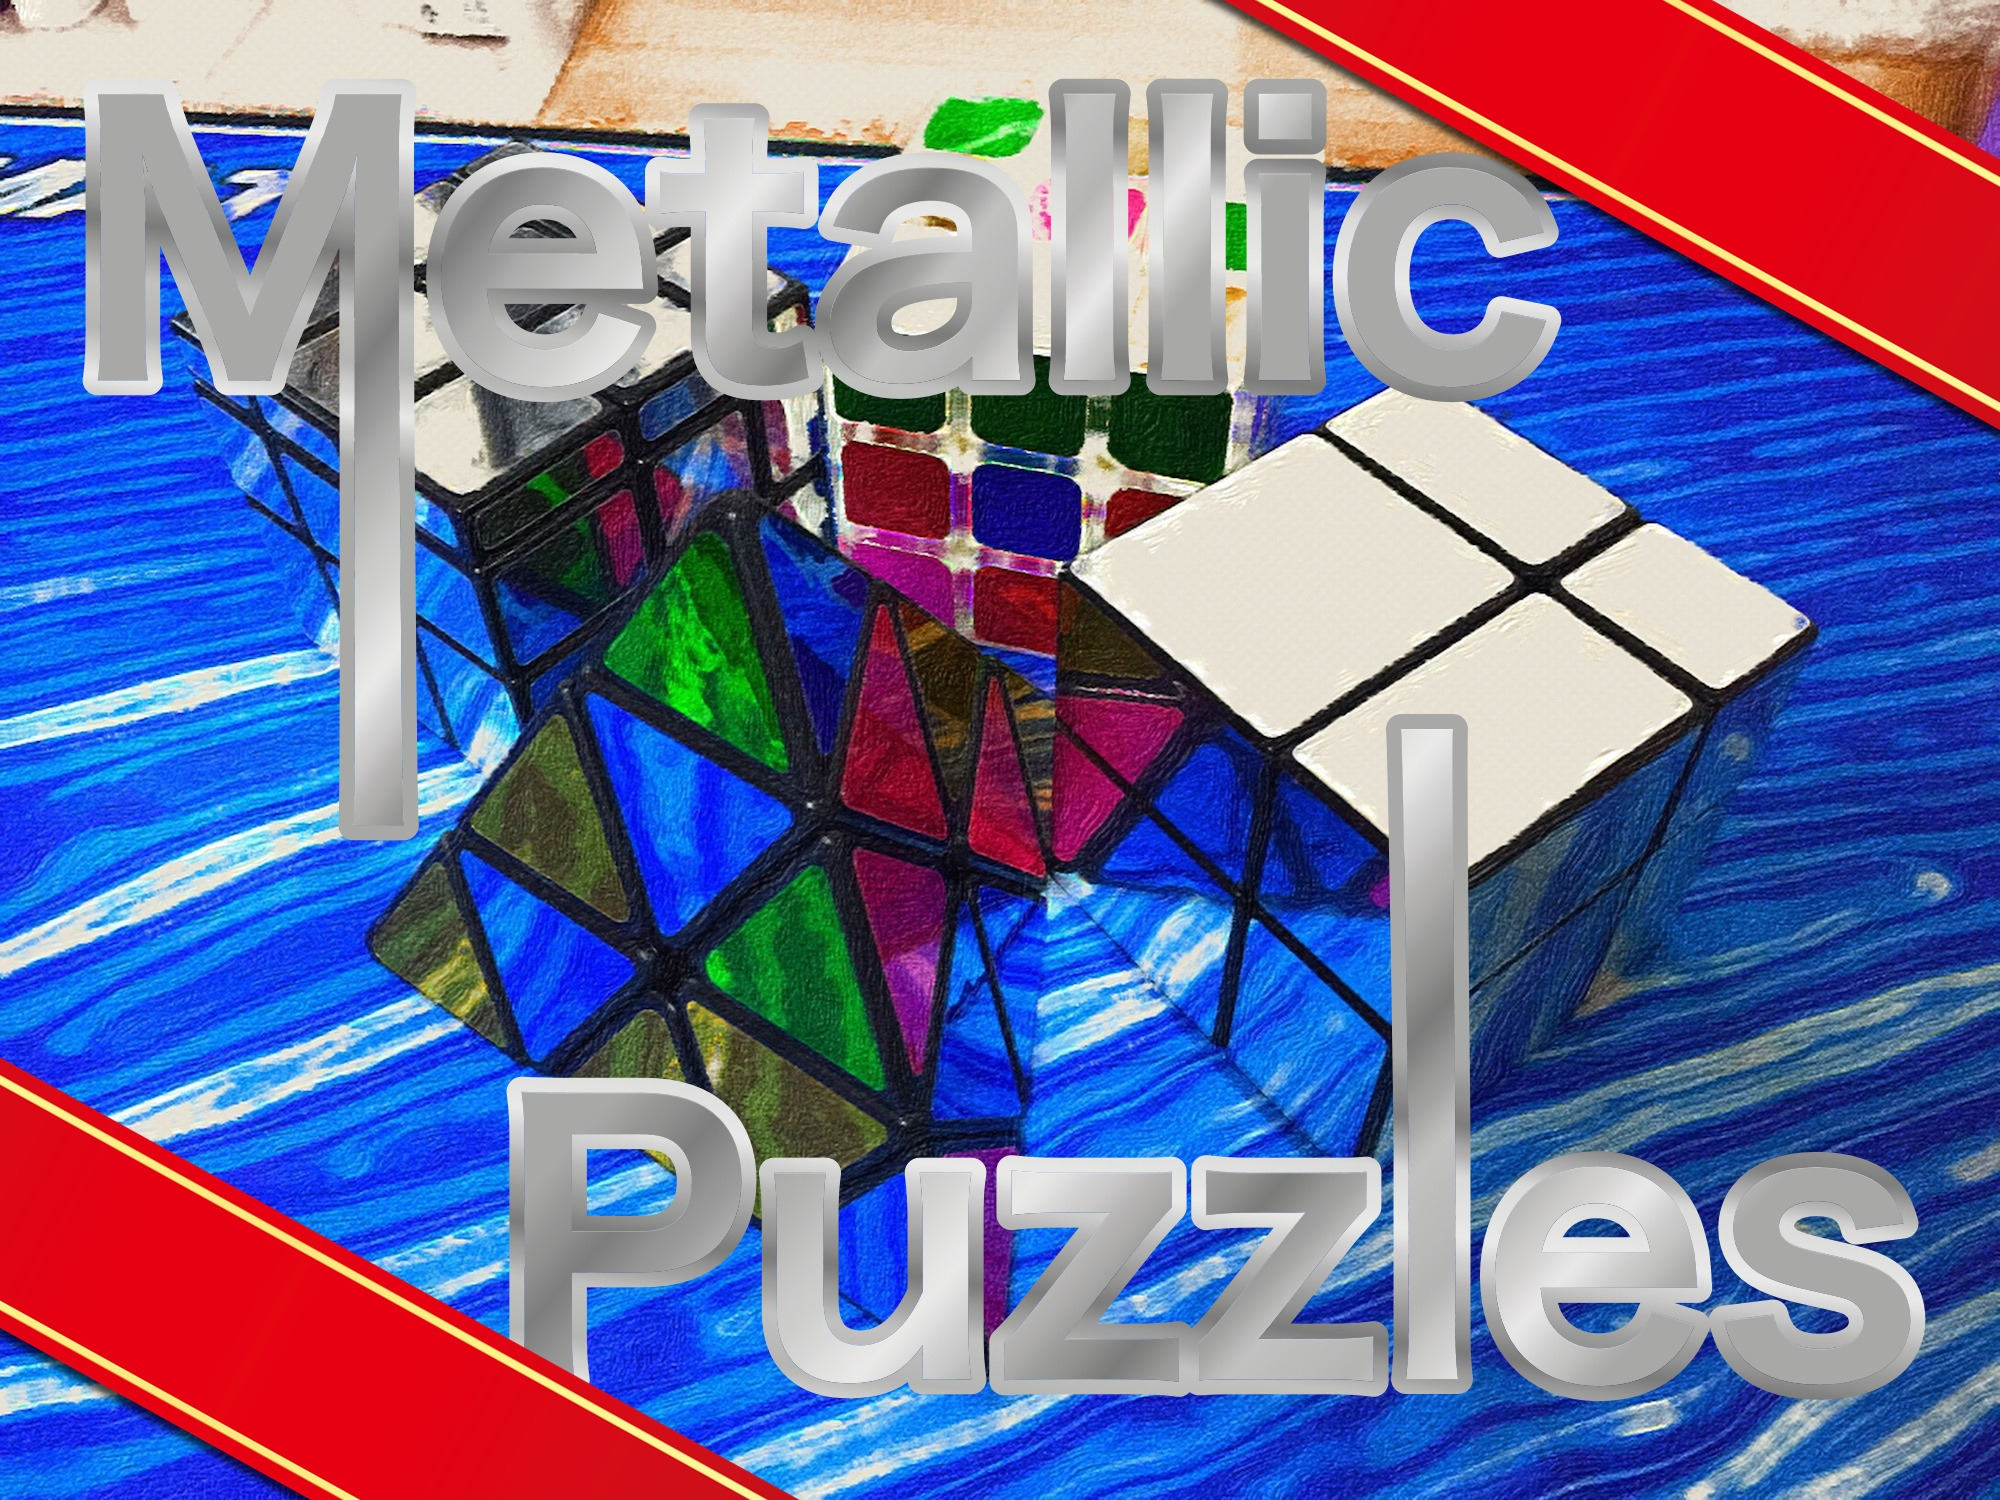 Metallic Puzzles